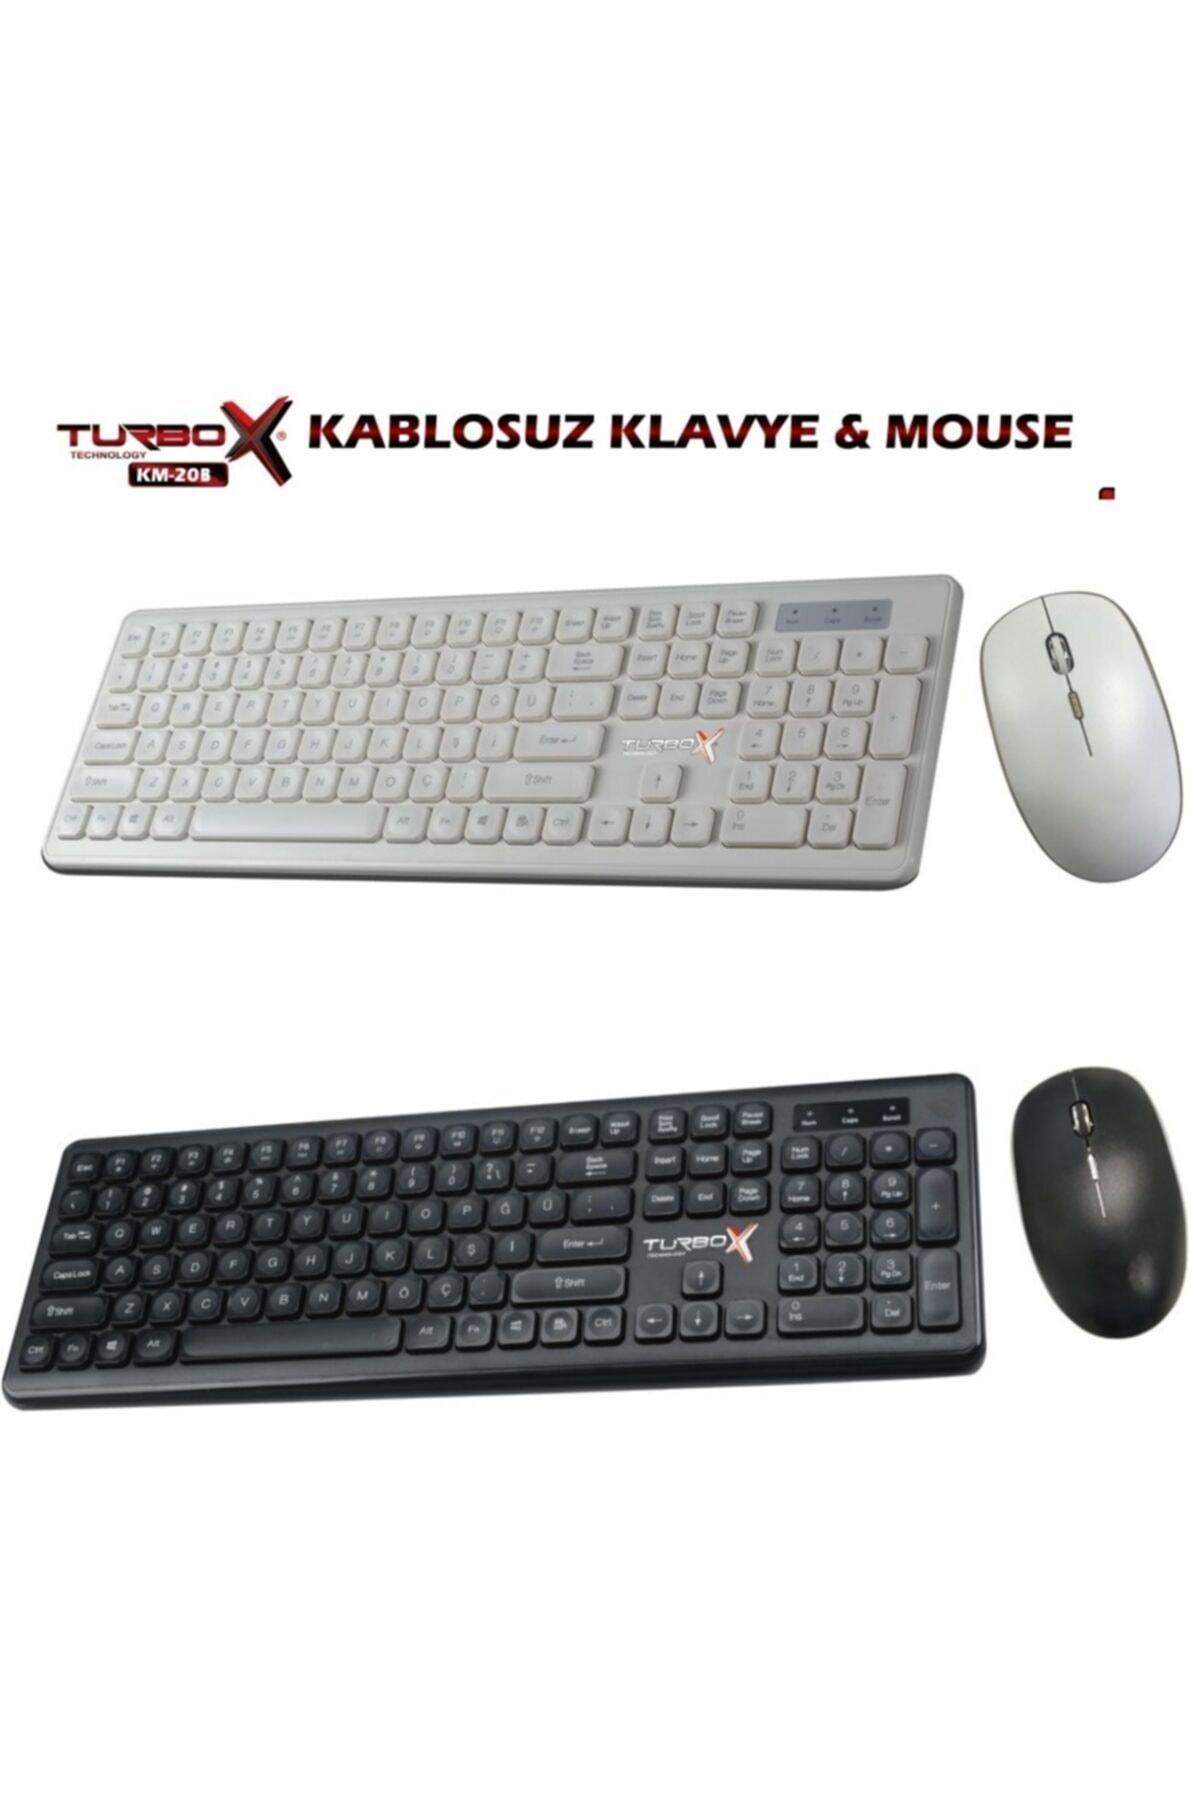 TURBOX Km-20 Wireless Multimedya Q Klavye Mouse Set 2